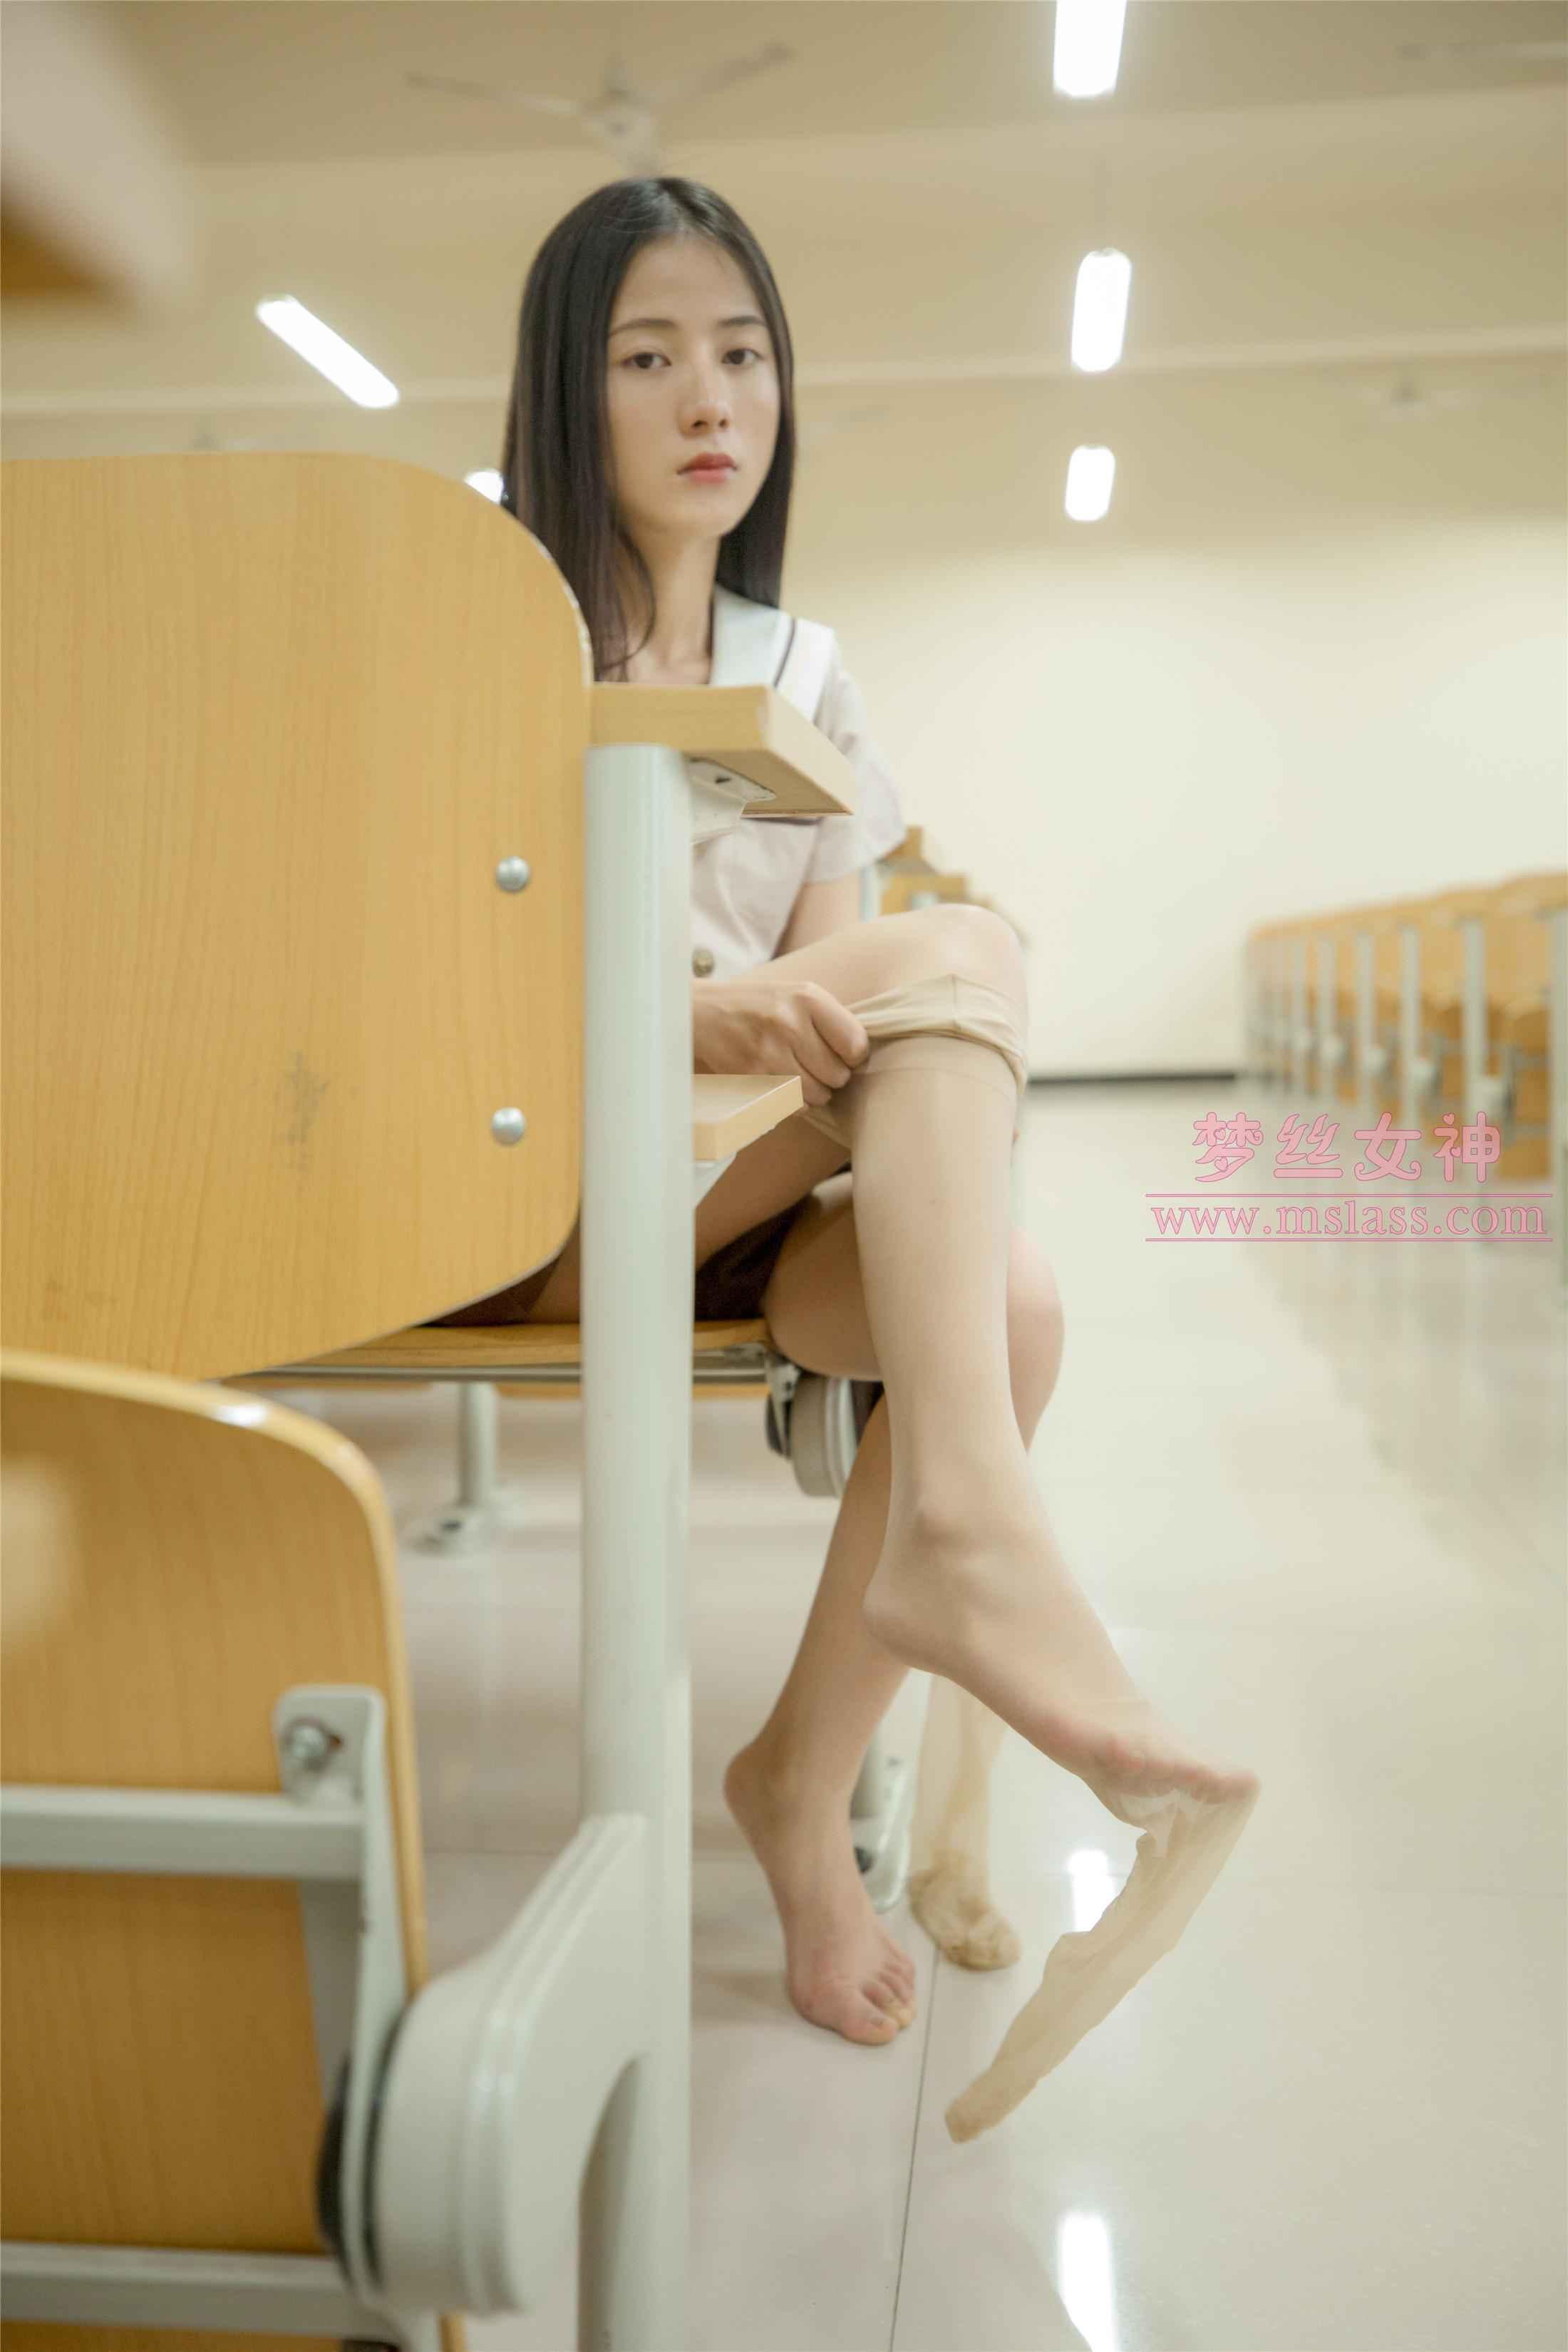 [MSLASS]梦丝女神 – 雪馨 清新的丝袜美 [61P]